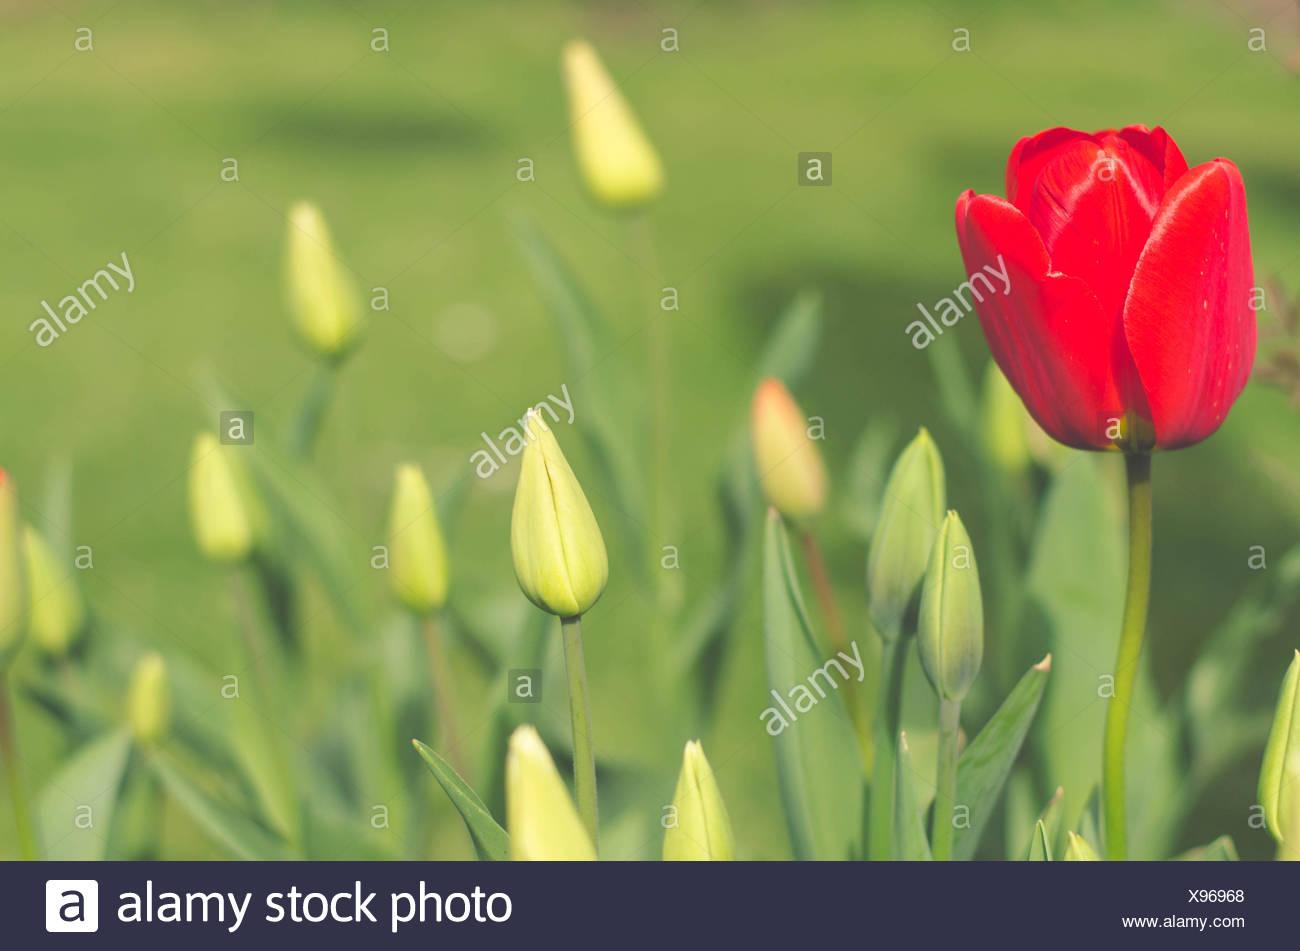 Red tulip flower - Stock Image